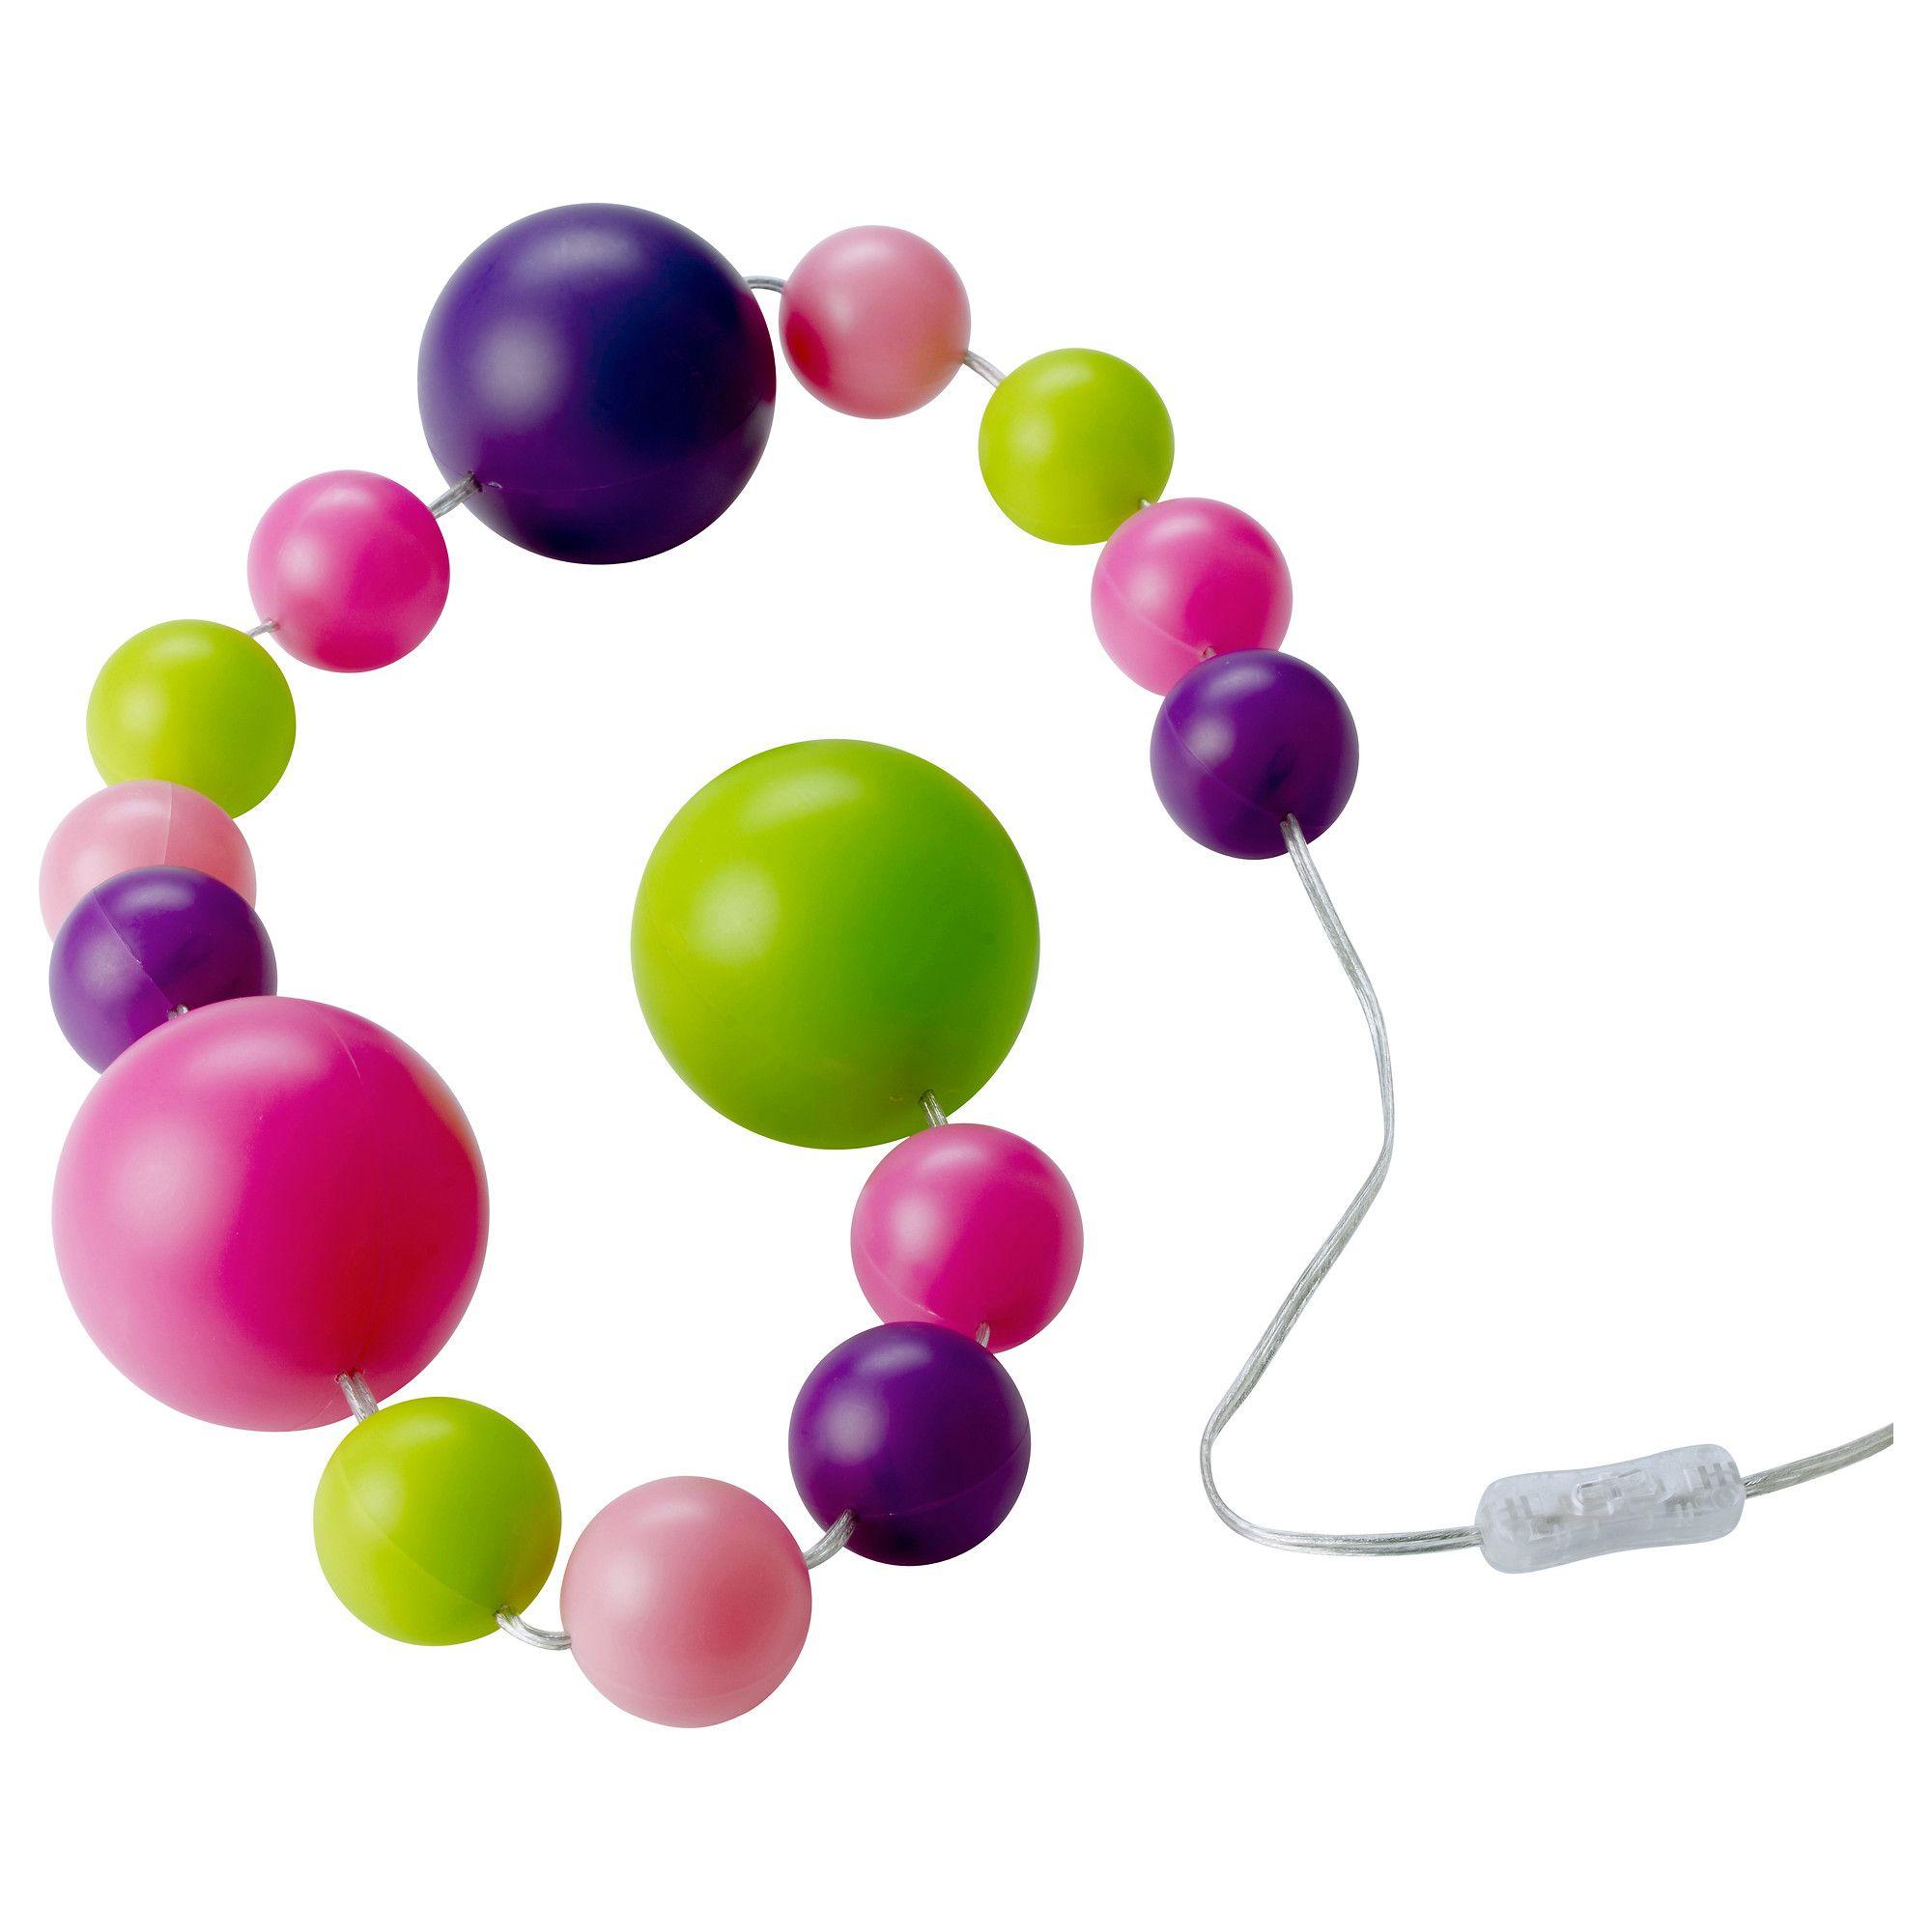 Finfin Guirlande Lumineuse Led 15 Boules Ikea Déco Perles